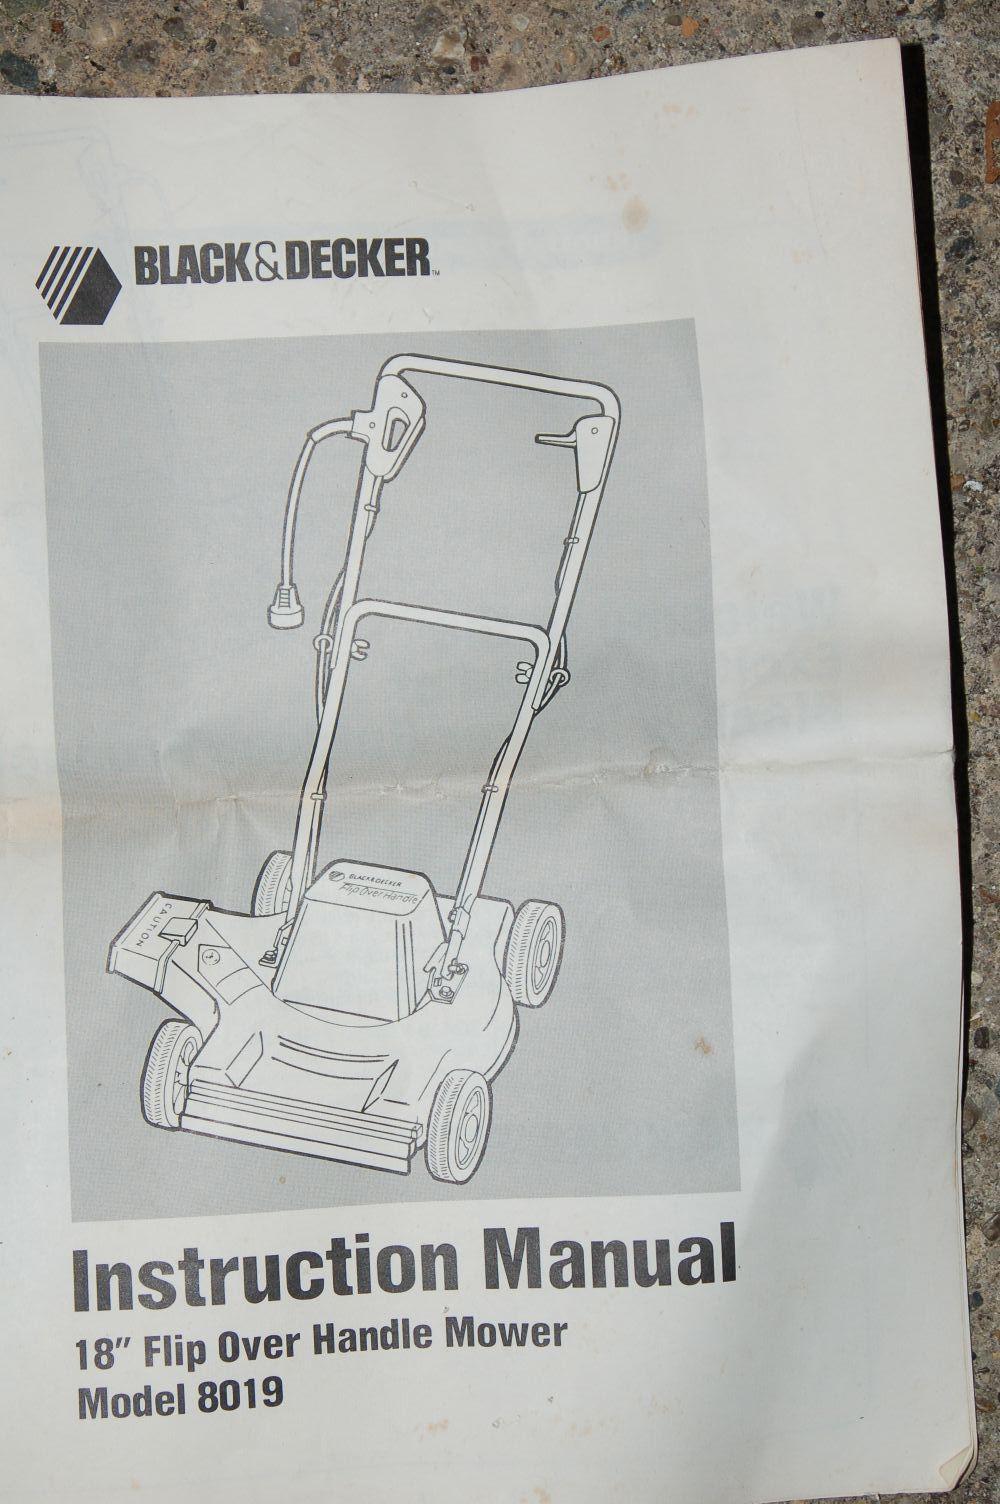 black amp decker lawn mower wiring diagram wiring diagram  wrg 8228] black amp decker lawn mower wiring diagramblack amp decker lawn mower wiring diagram